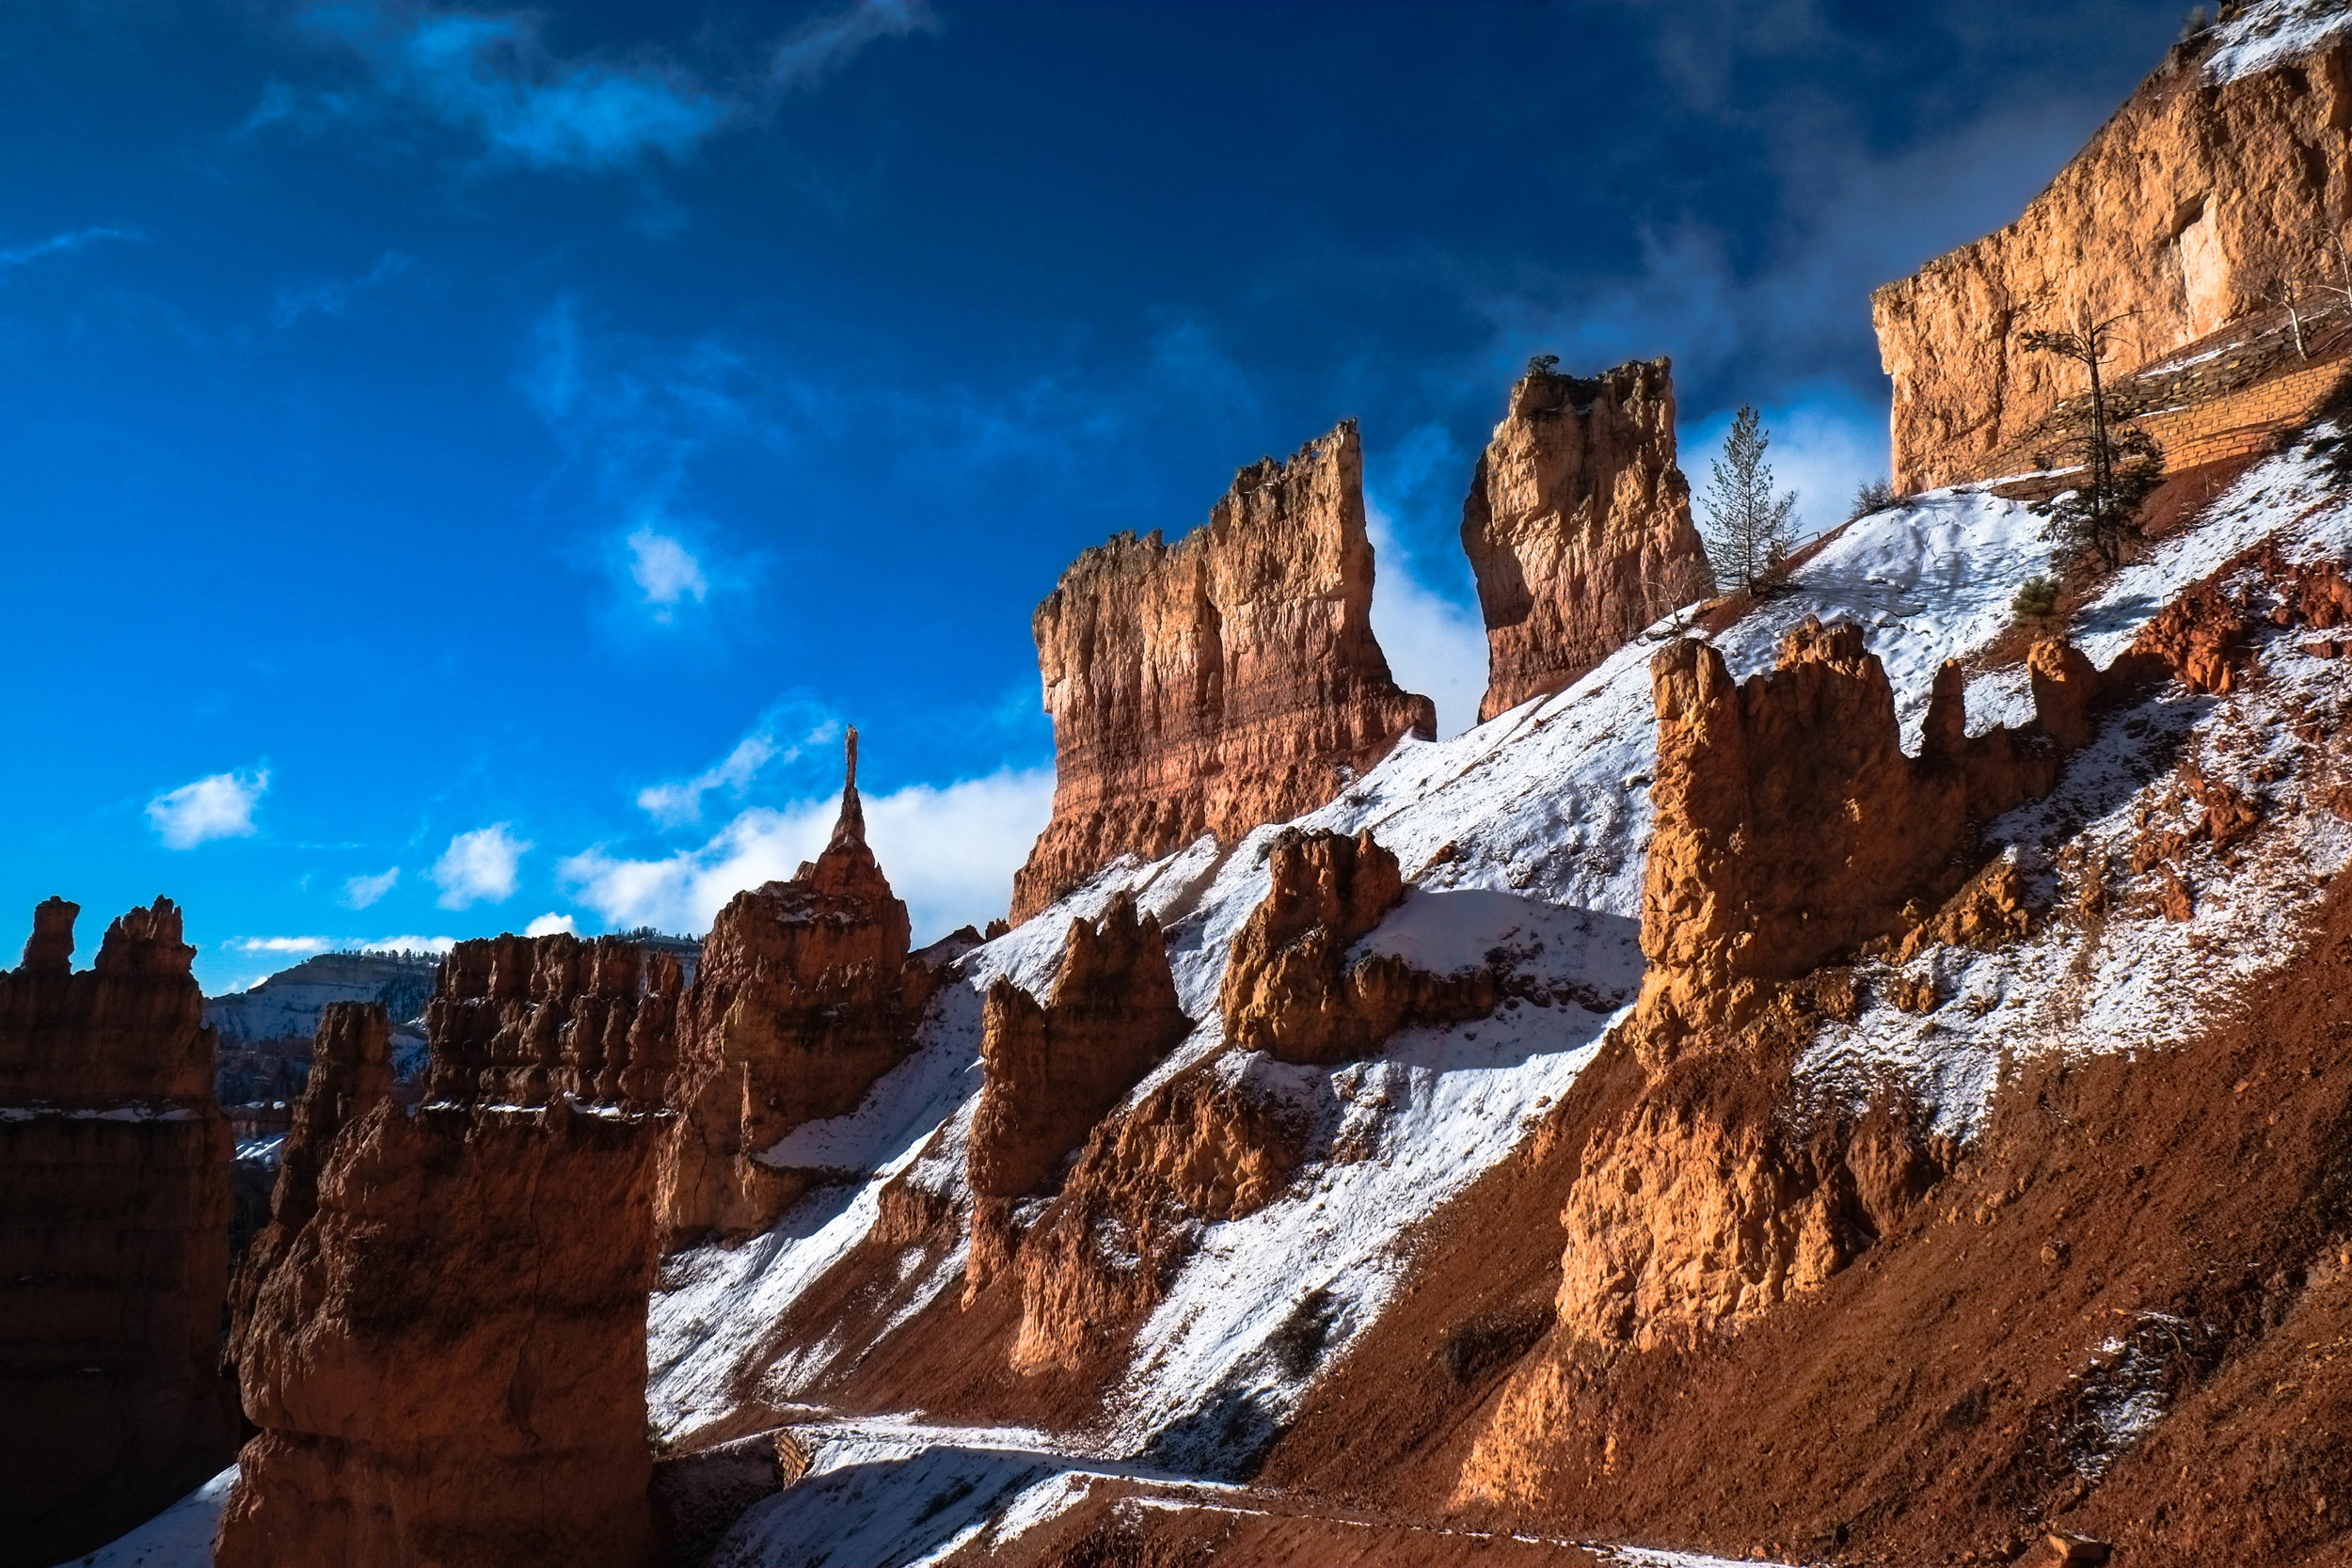 Bryce Canyon National Park in Utah. Credit: Stefanie Payne